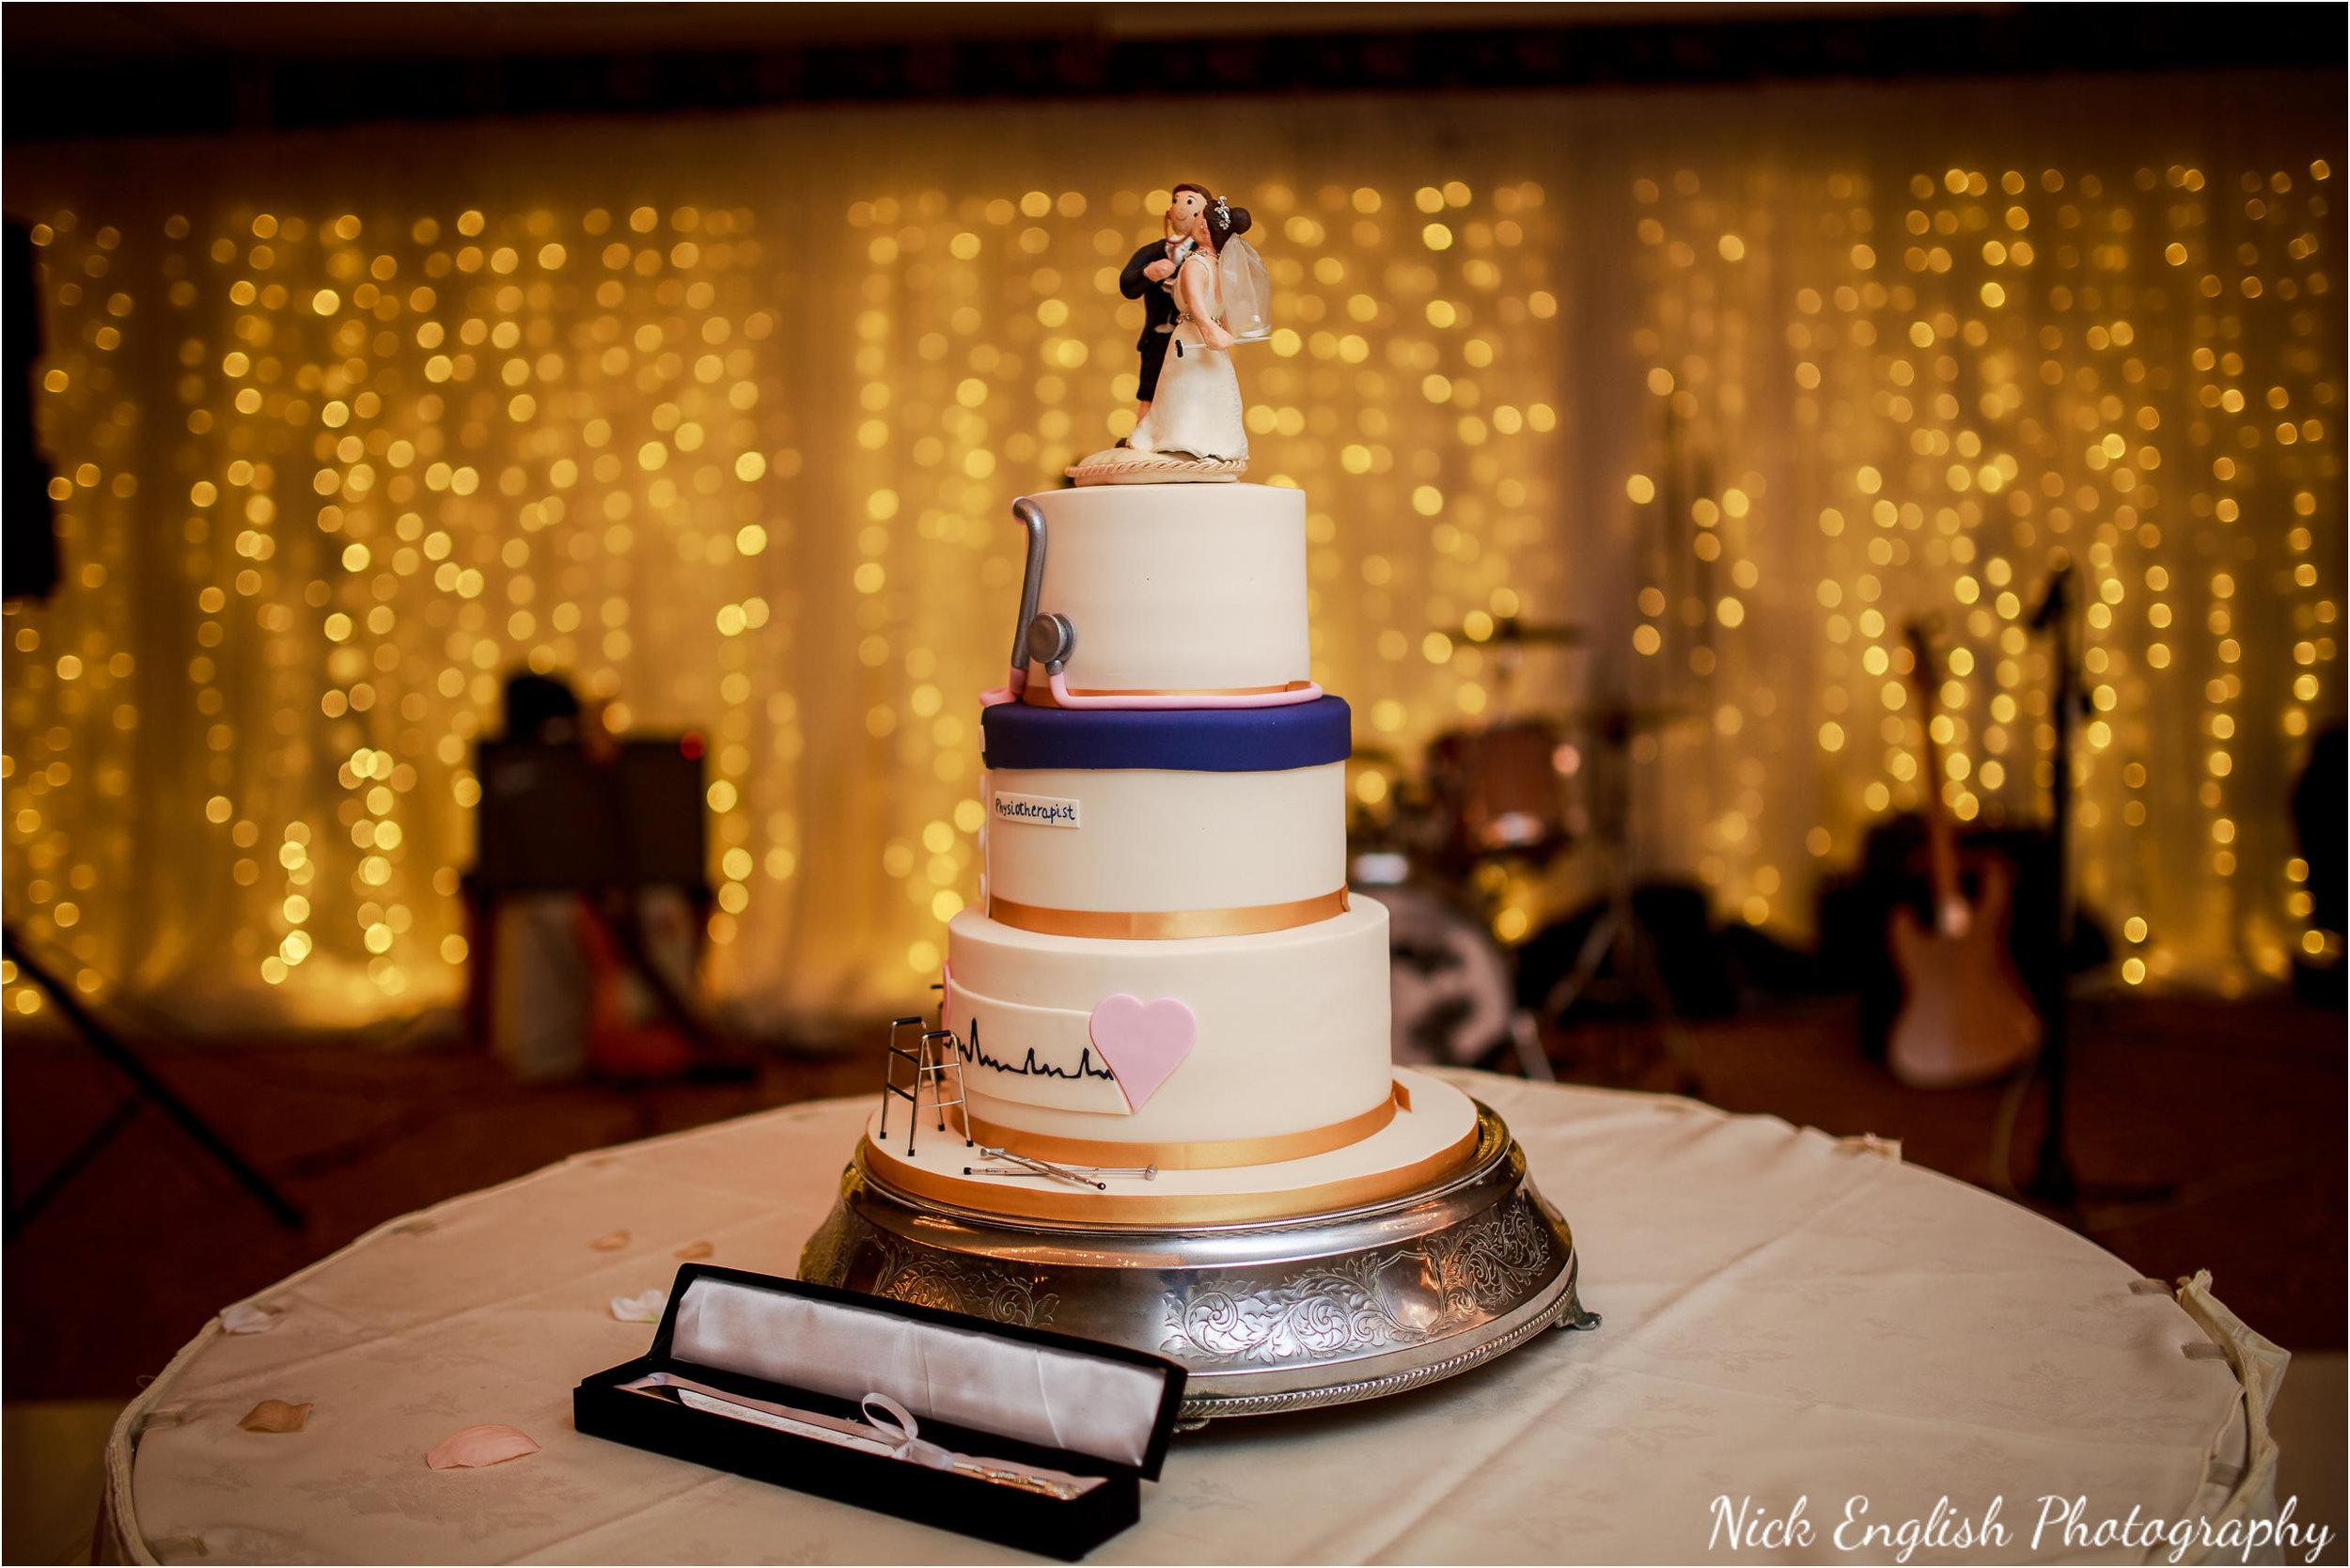 Emily David Wedding Photographs at Barton Grange Preston by Nick English Photography 218jpg.jpeg